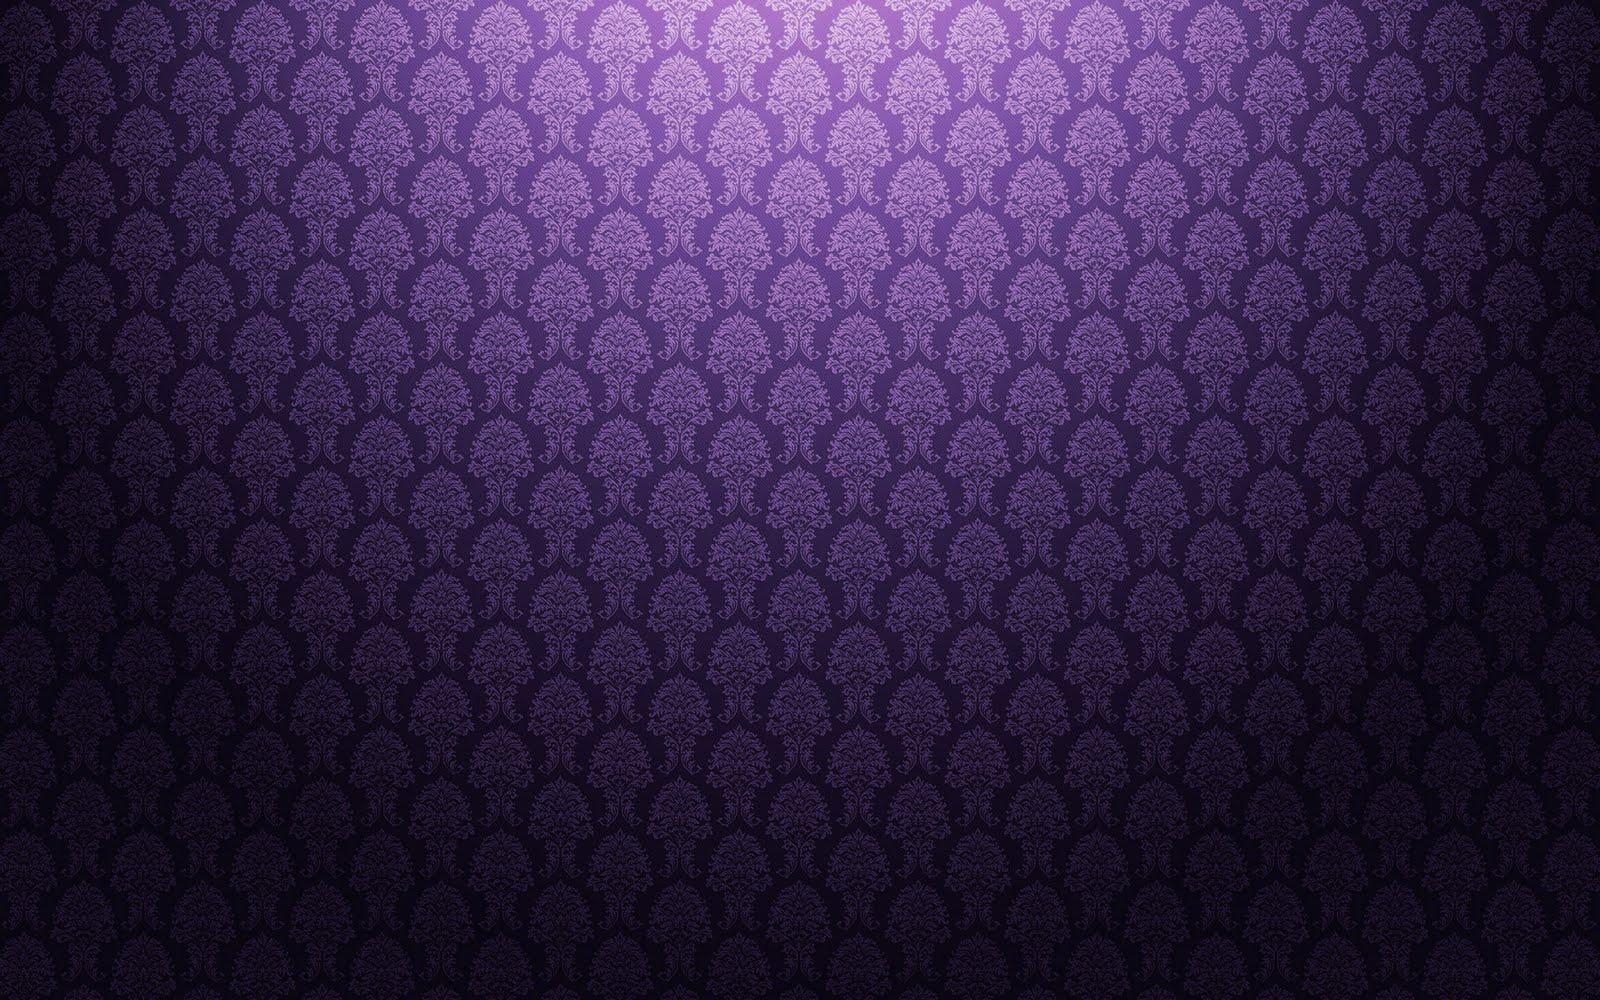 47 Hd Pattern Wallpaper On Wallpapersafari Images, Photos, Reviews